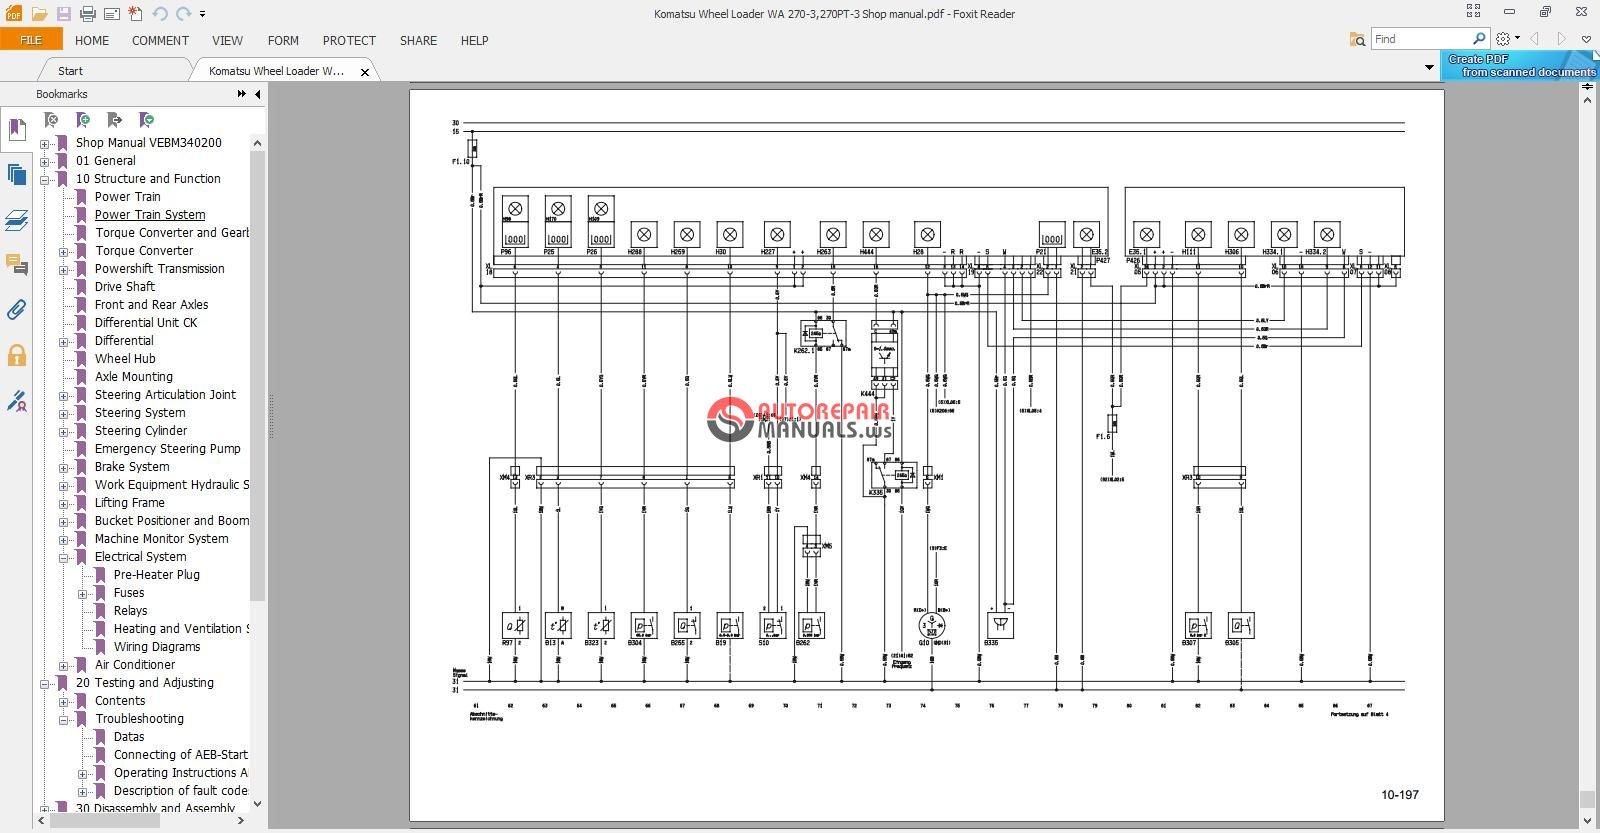 1998 Kobelco Loader Manual Fiat W170 W170pl Evolution Wiring Diagram For Kids